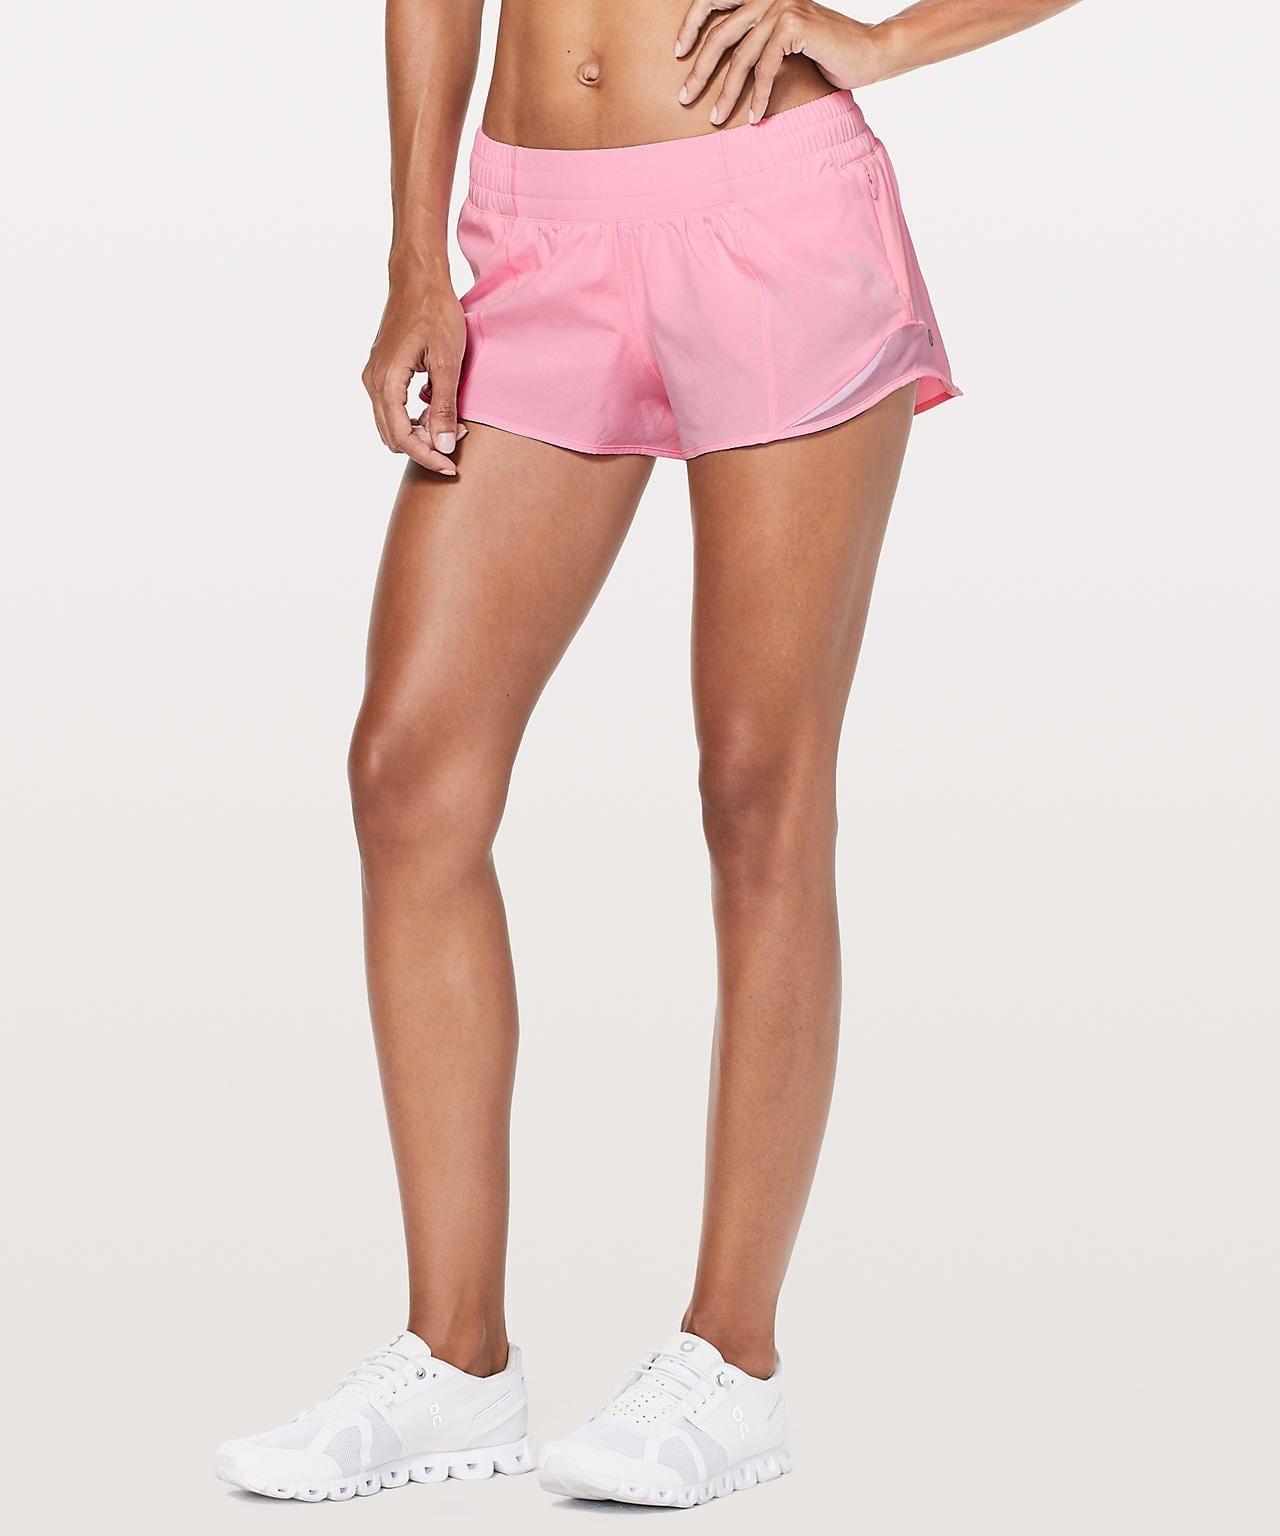 Lululemon Upload - Hotty Hot Short II - Miami Pink